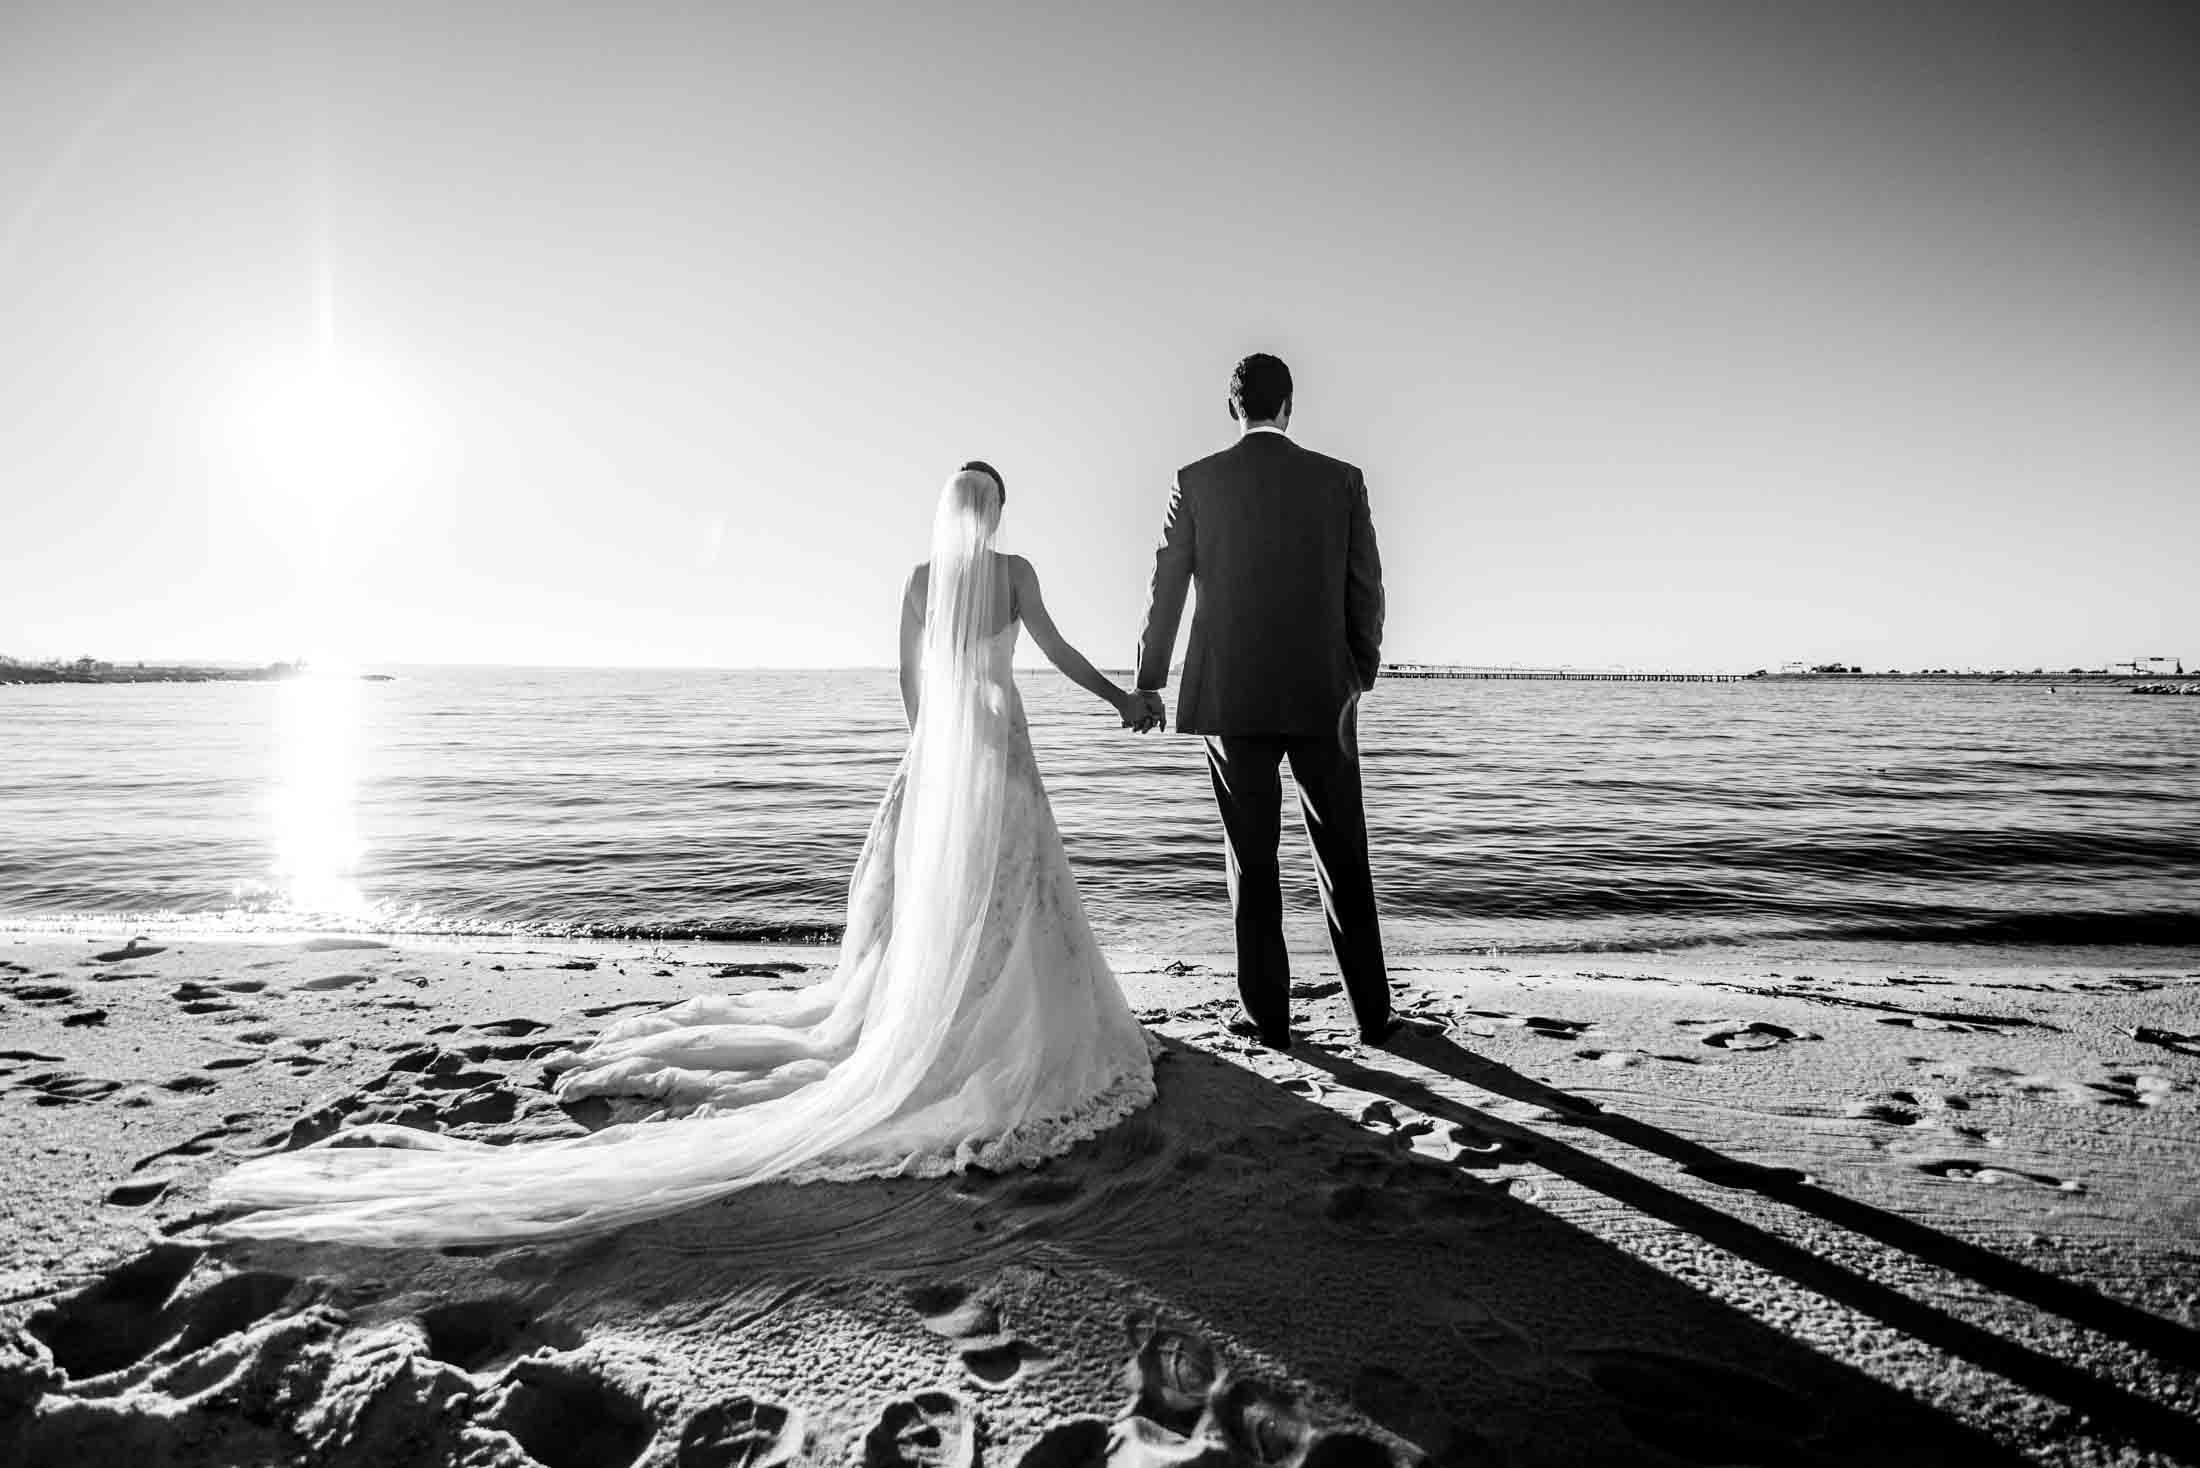 dc+metro+wedding+photographer+vadym+guliuk+photography+wedding+bride+and+groom-2035.jpg